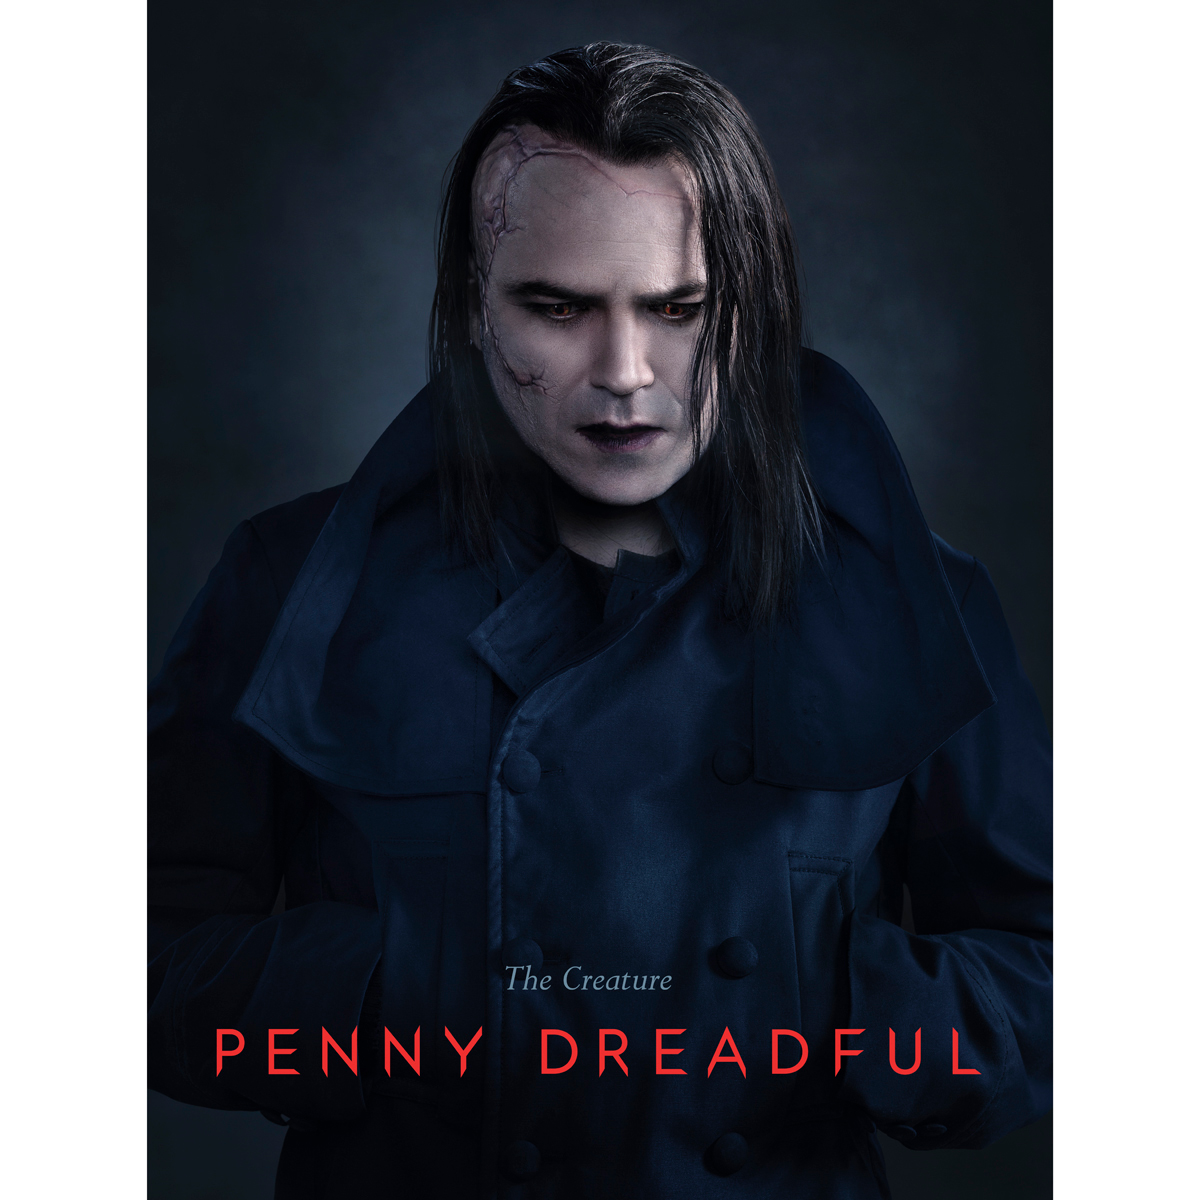 Penny Dreadful Creature Giclee Print [18x24]